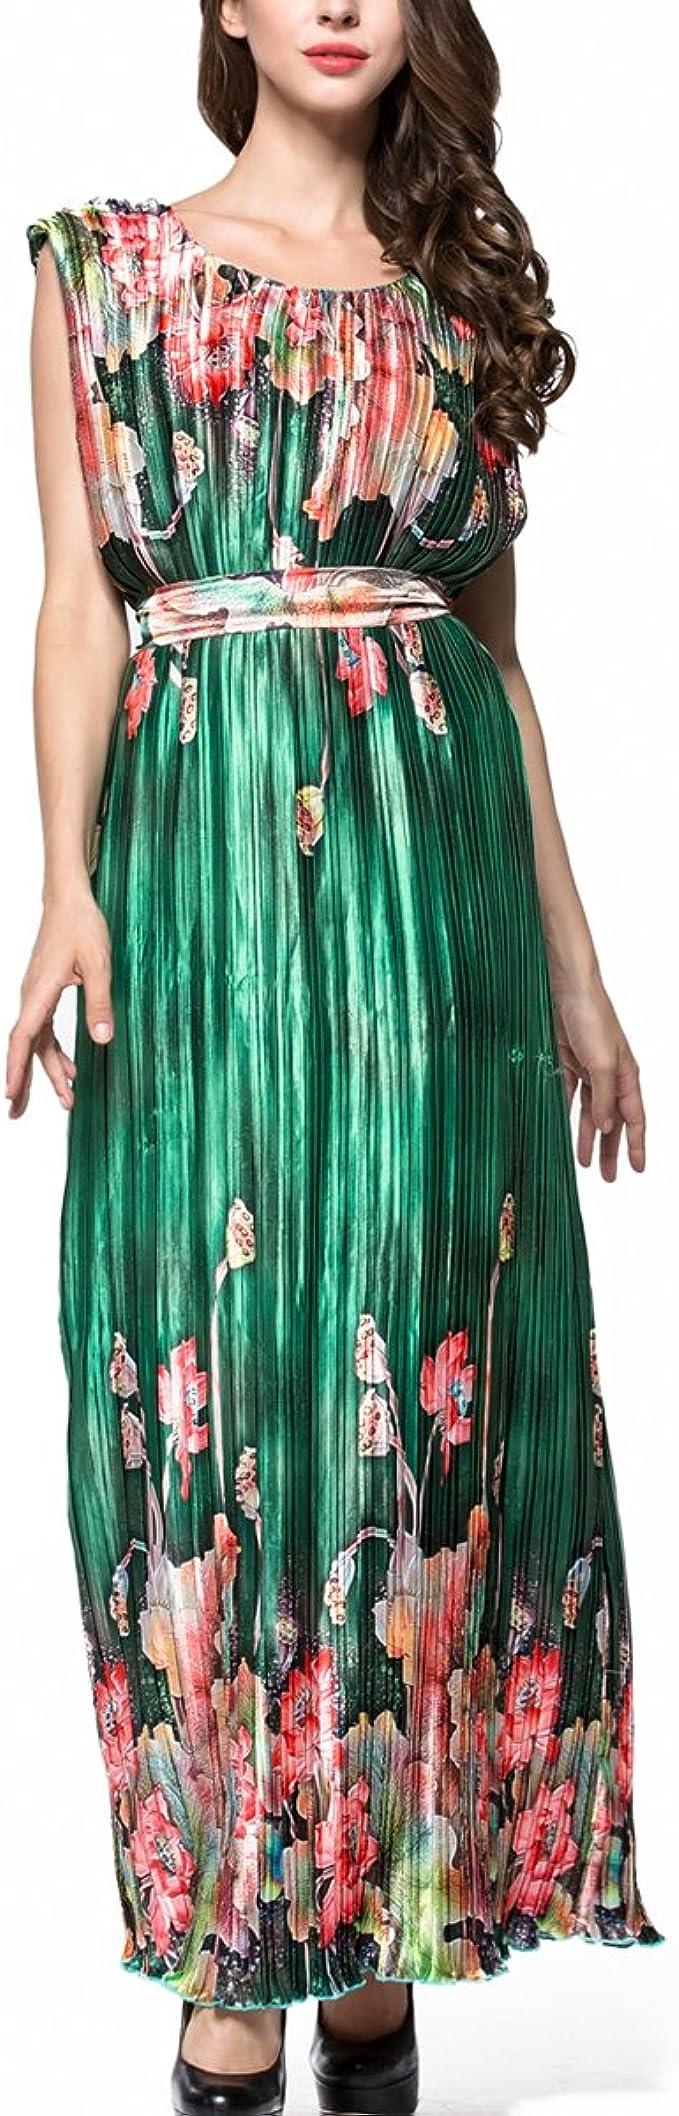 Fringe Linen Dress \u2206 Tribal Boho Dresses for Women \u2206 Bohemian Linen Tunic w Belt \u2206 Ibiza Goa Nomad Bali Raw Dress by Chintamani Light Grey